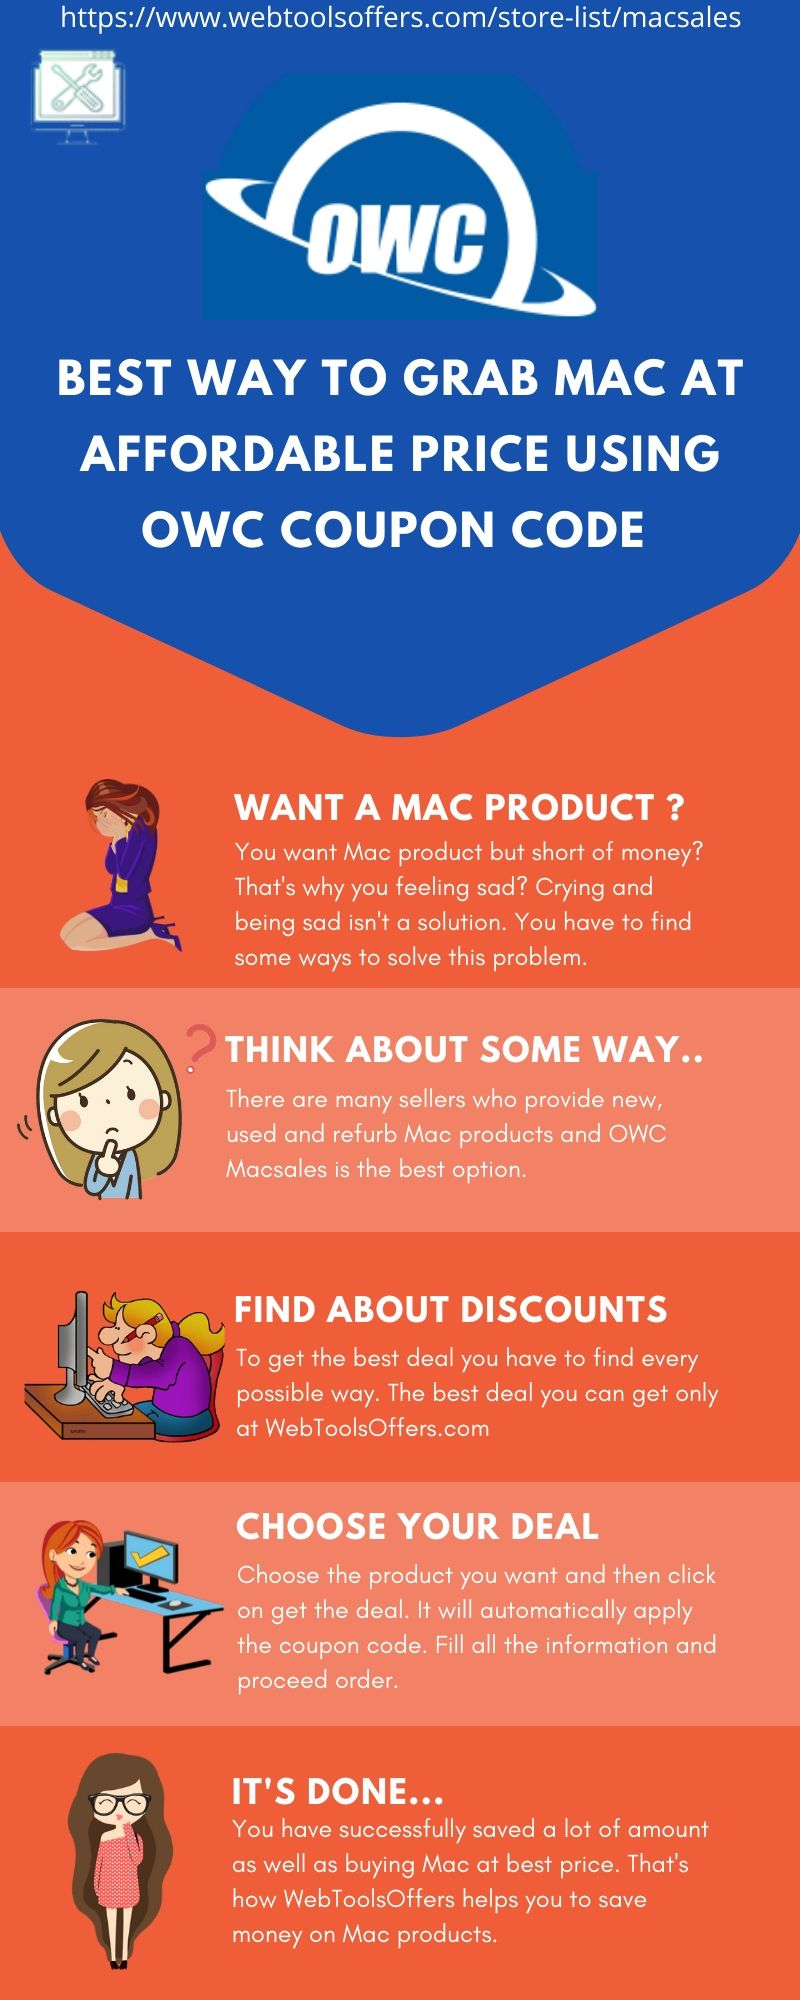 OWC Mac Sales Promo Code